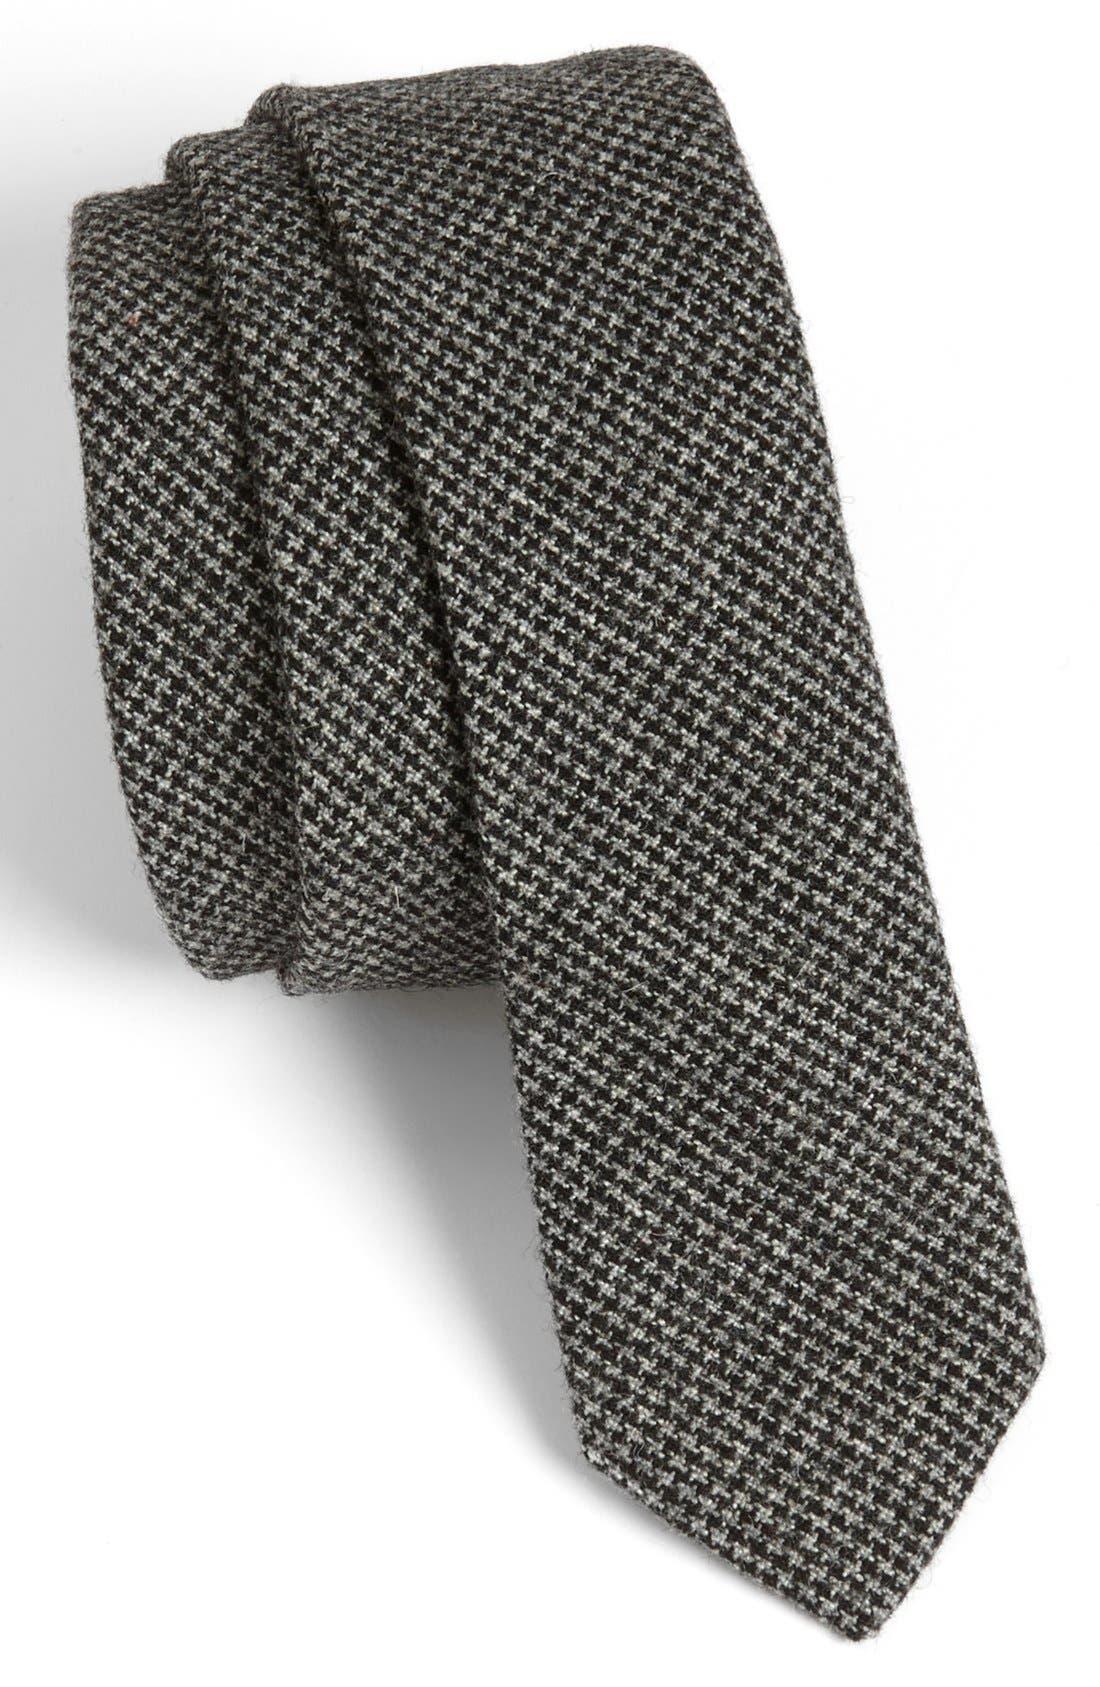 Alternate Image 1 Selected - Topman Houndstooth Tie